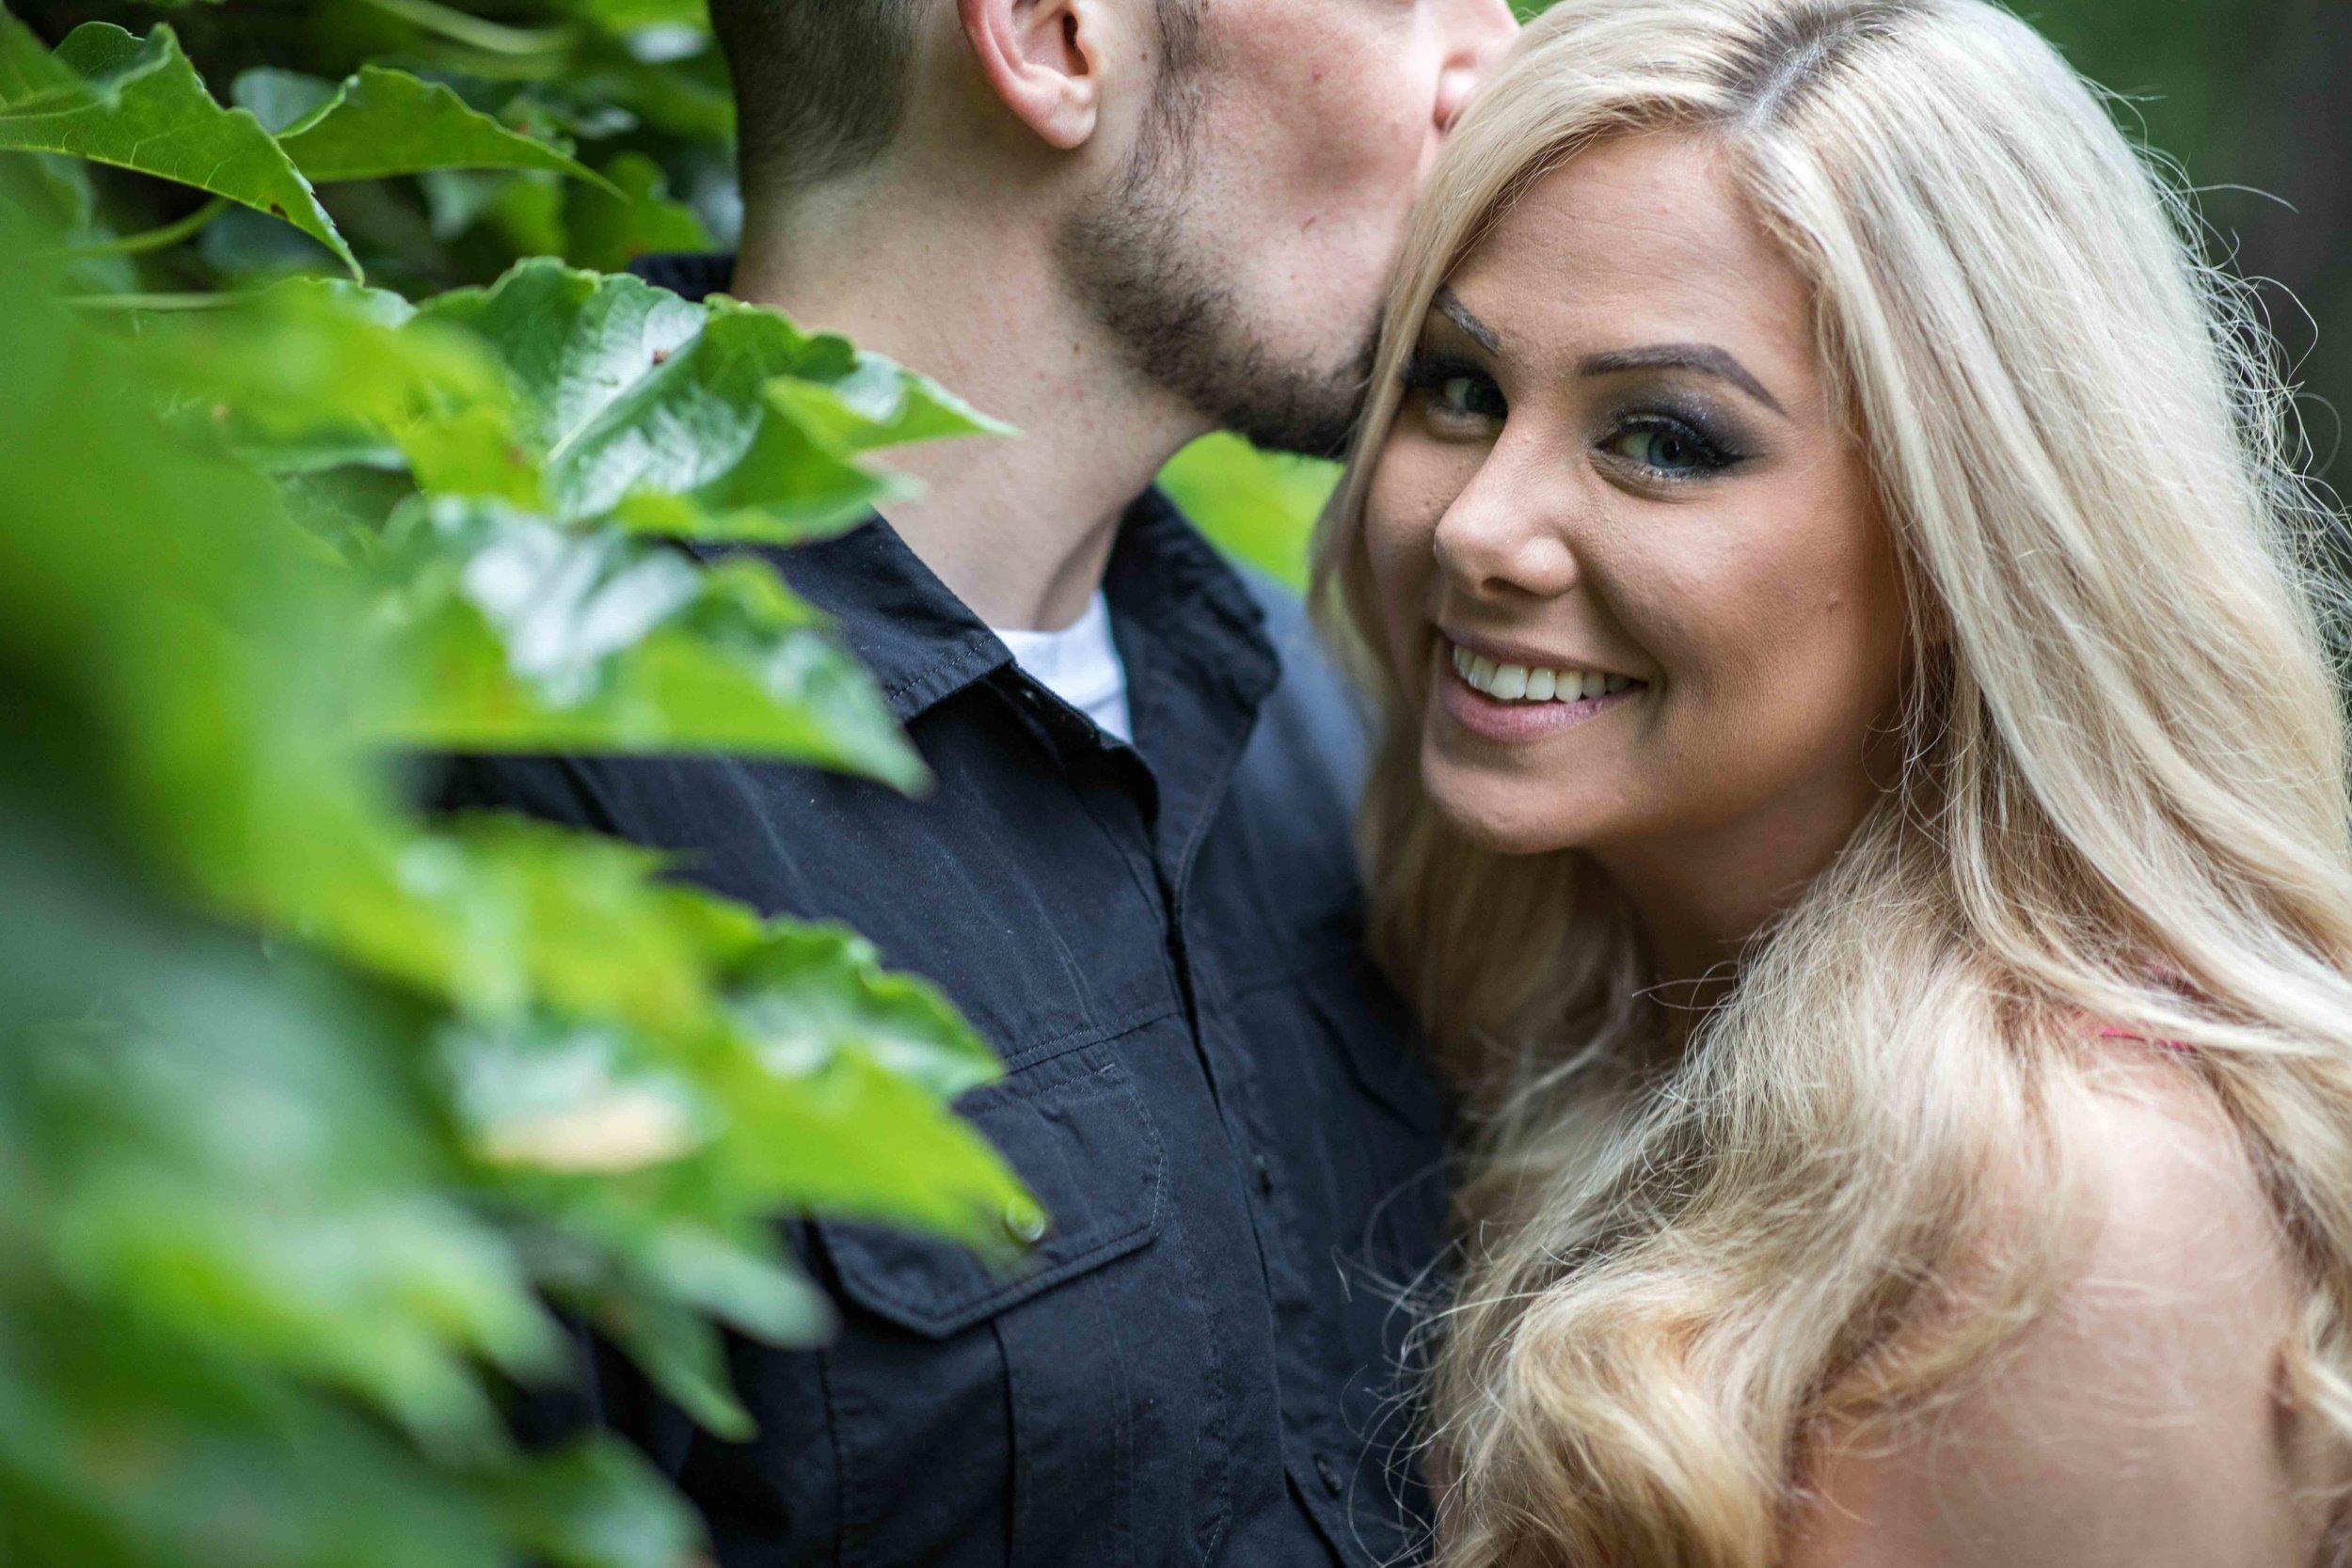 A hidden kiss in the ivy at Vandercook Hall in Kalamazoo Michigan